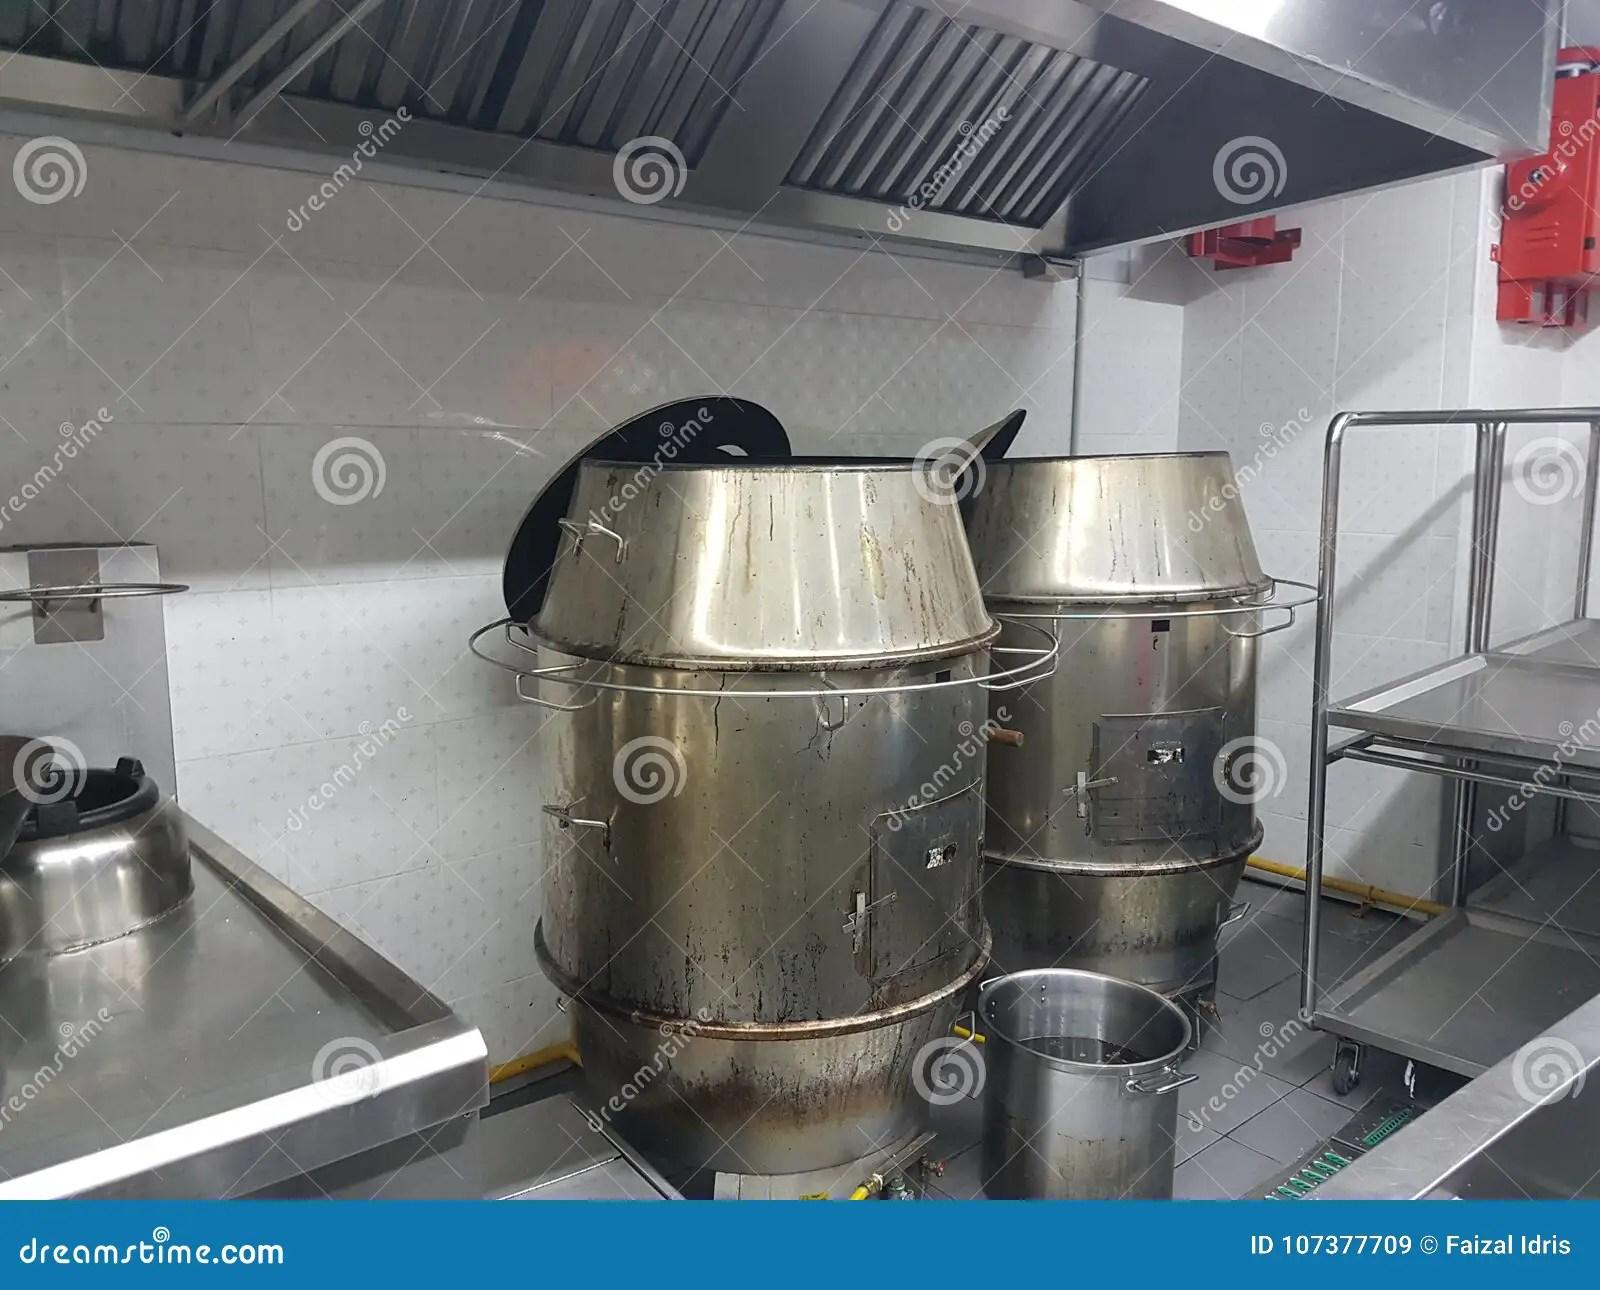 kitchen banquet pet friendly hotels with kitchens 2018年1月8日 吉隆坡宴会厨房舞厅的固定设备编辑类库存图片 图片包括有 吉隆坡宴会厨房舞厅的固定设备